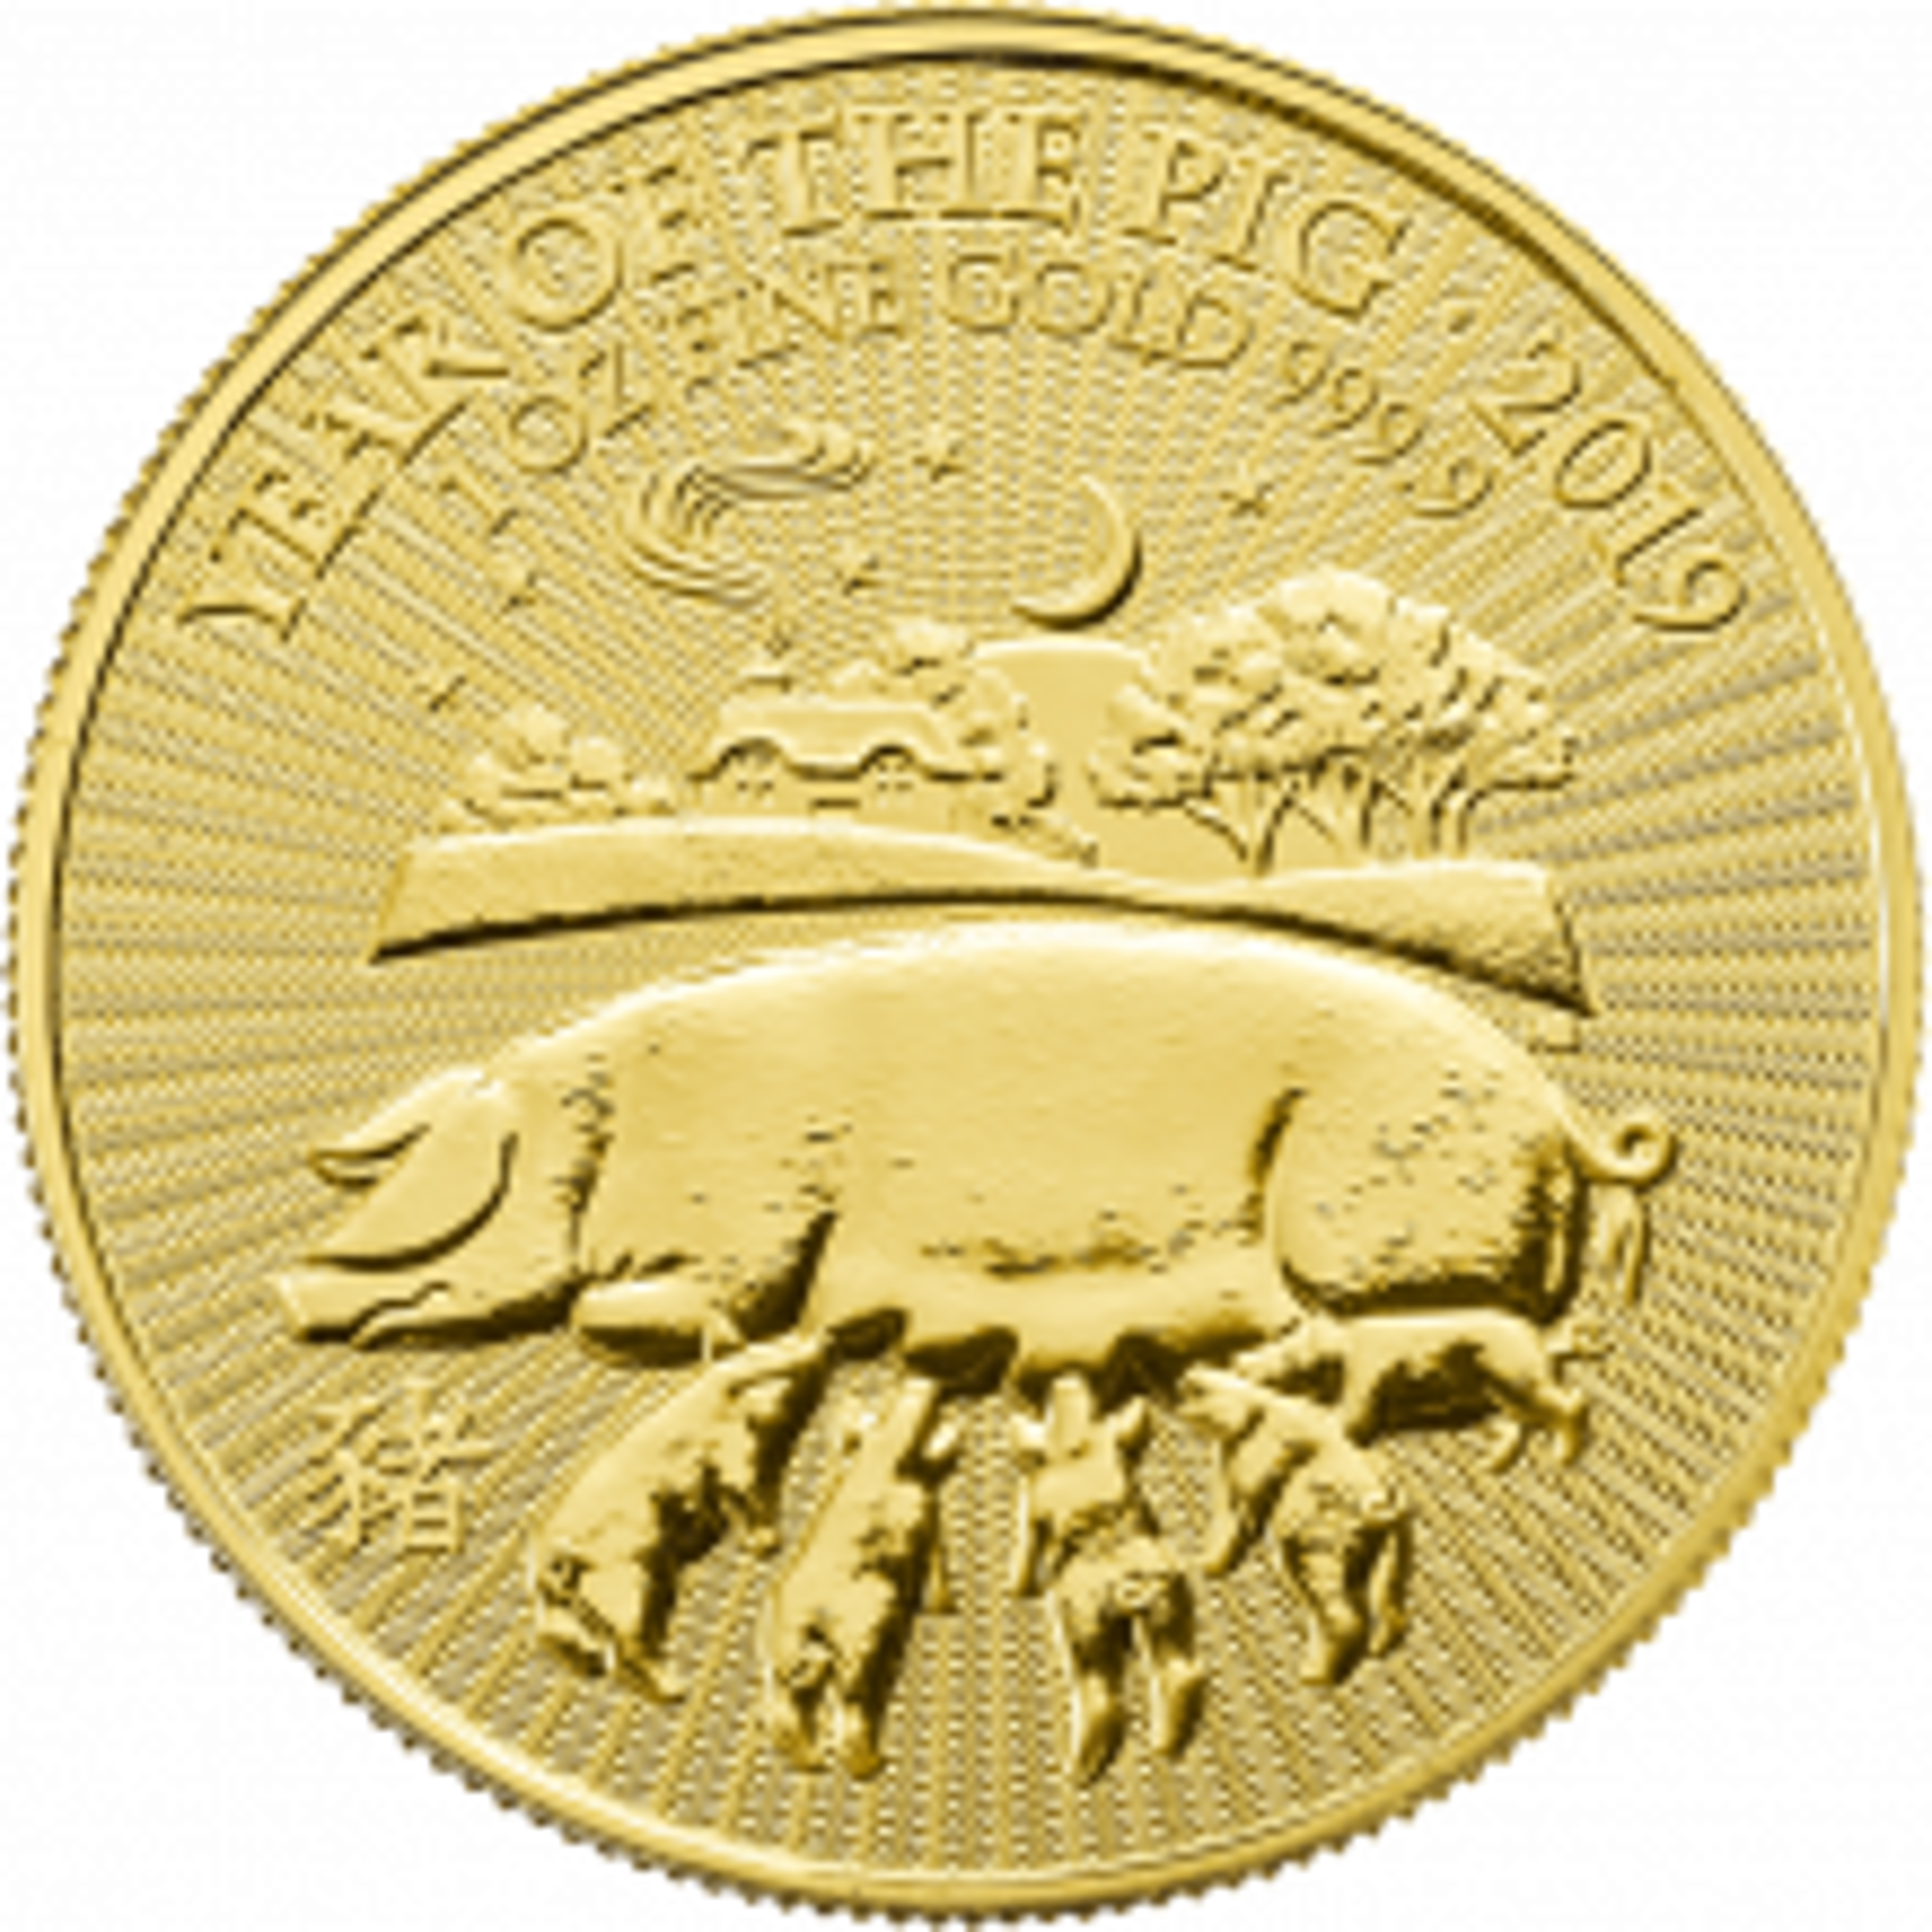 1 Troy ounce gouden munt UK Lunar 2019